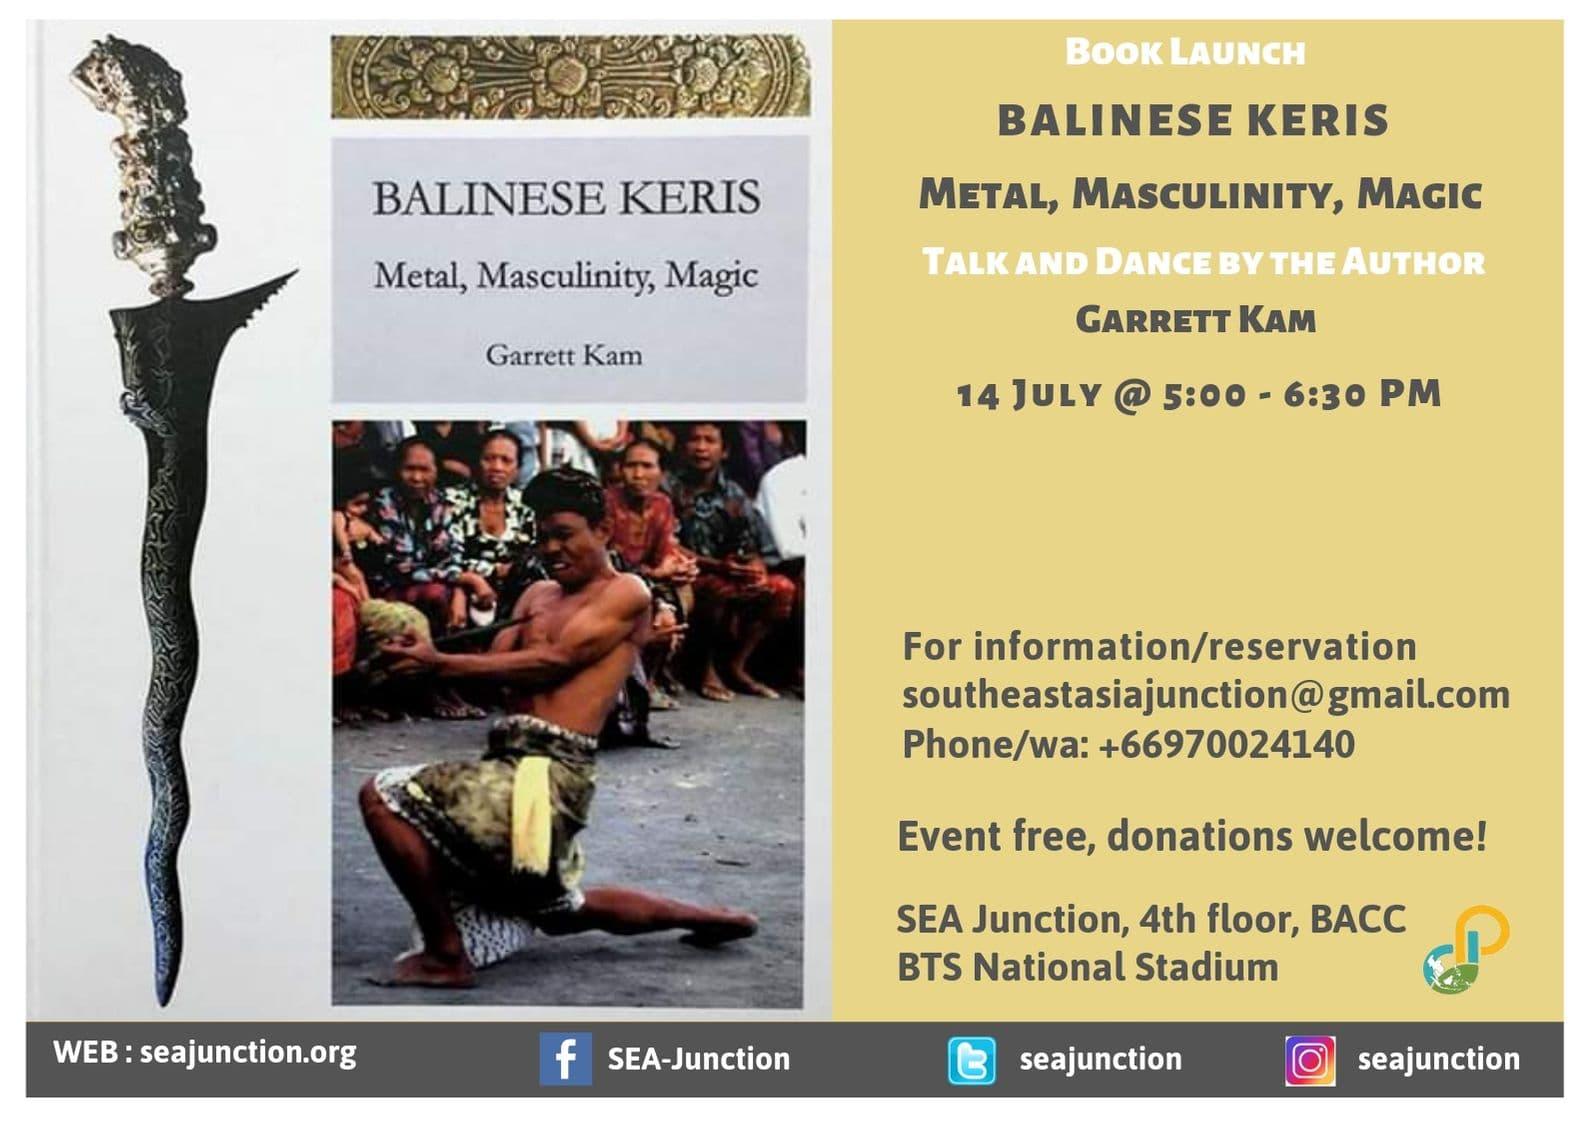 26.Book-launch-Balinese-Keris-Metal-Masculinity-Magic-by-Garrett-Kam-on-14.07.19